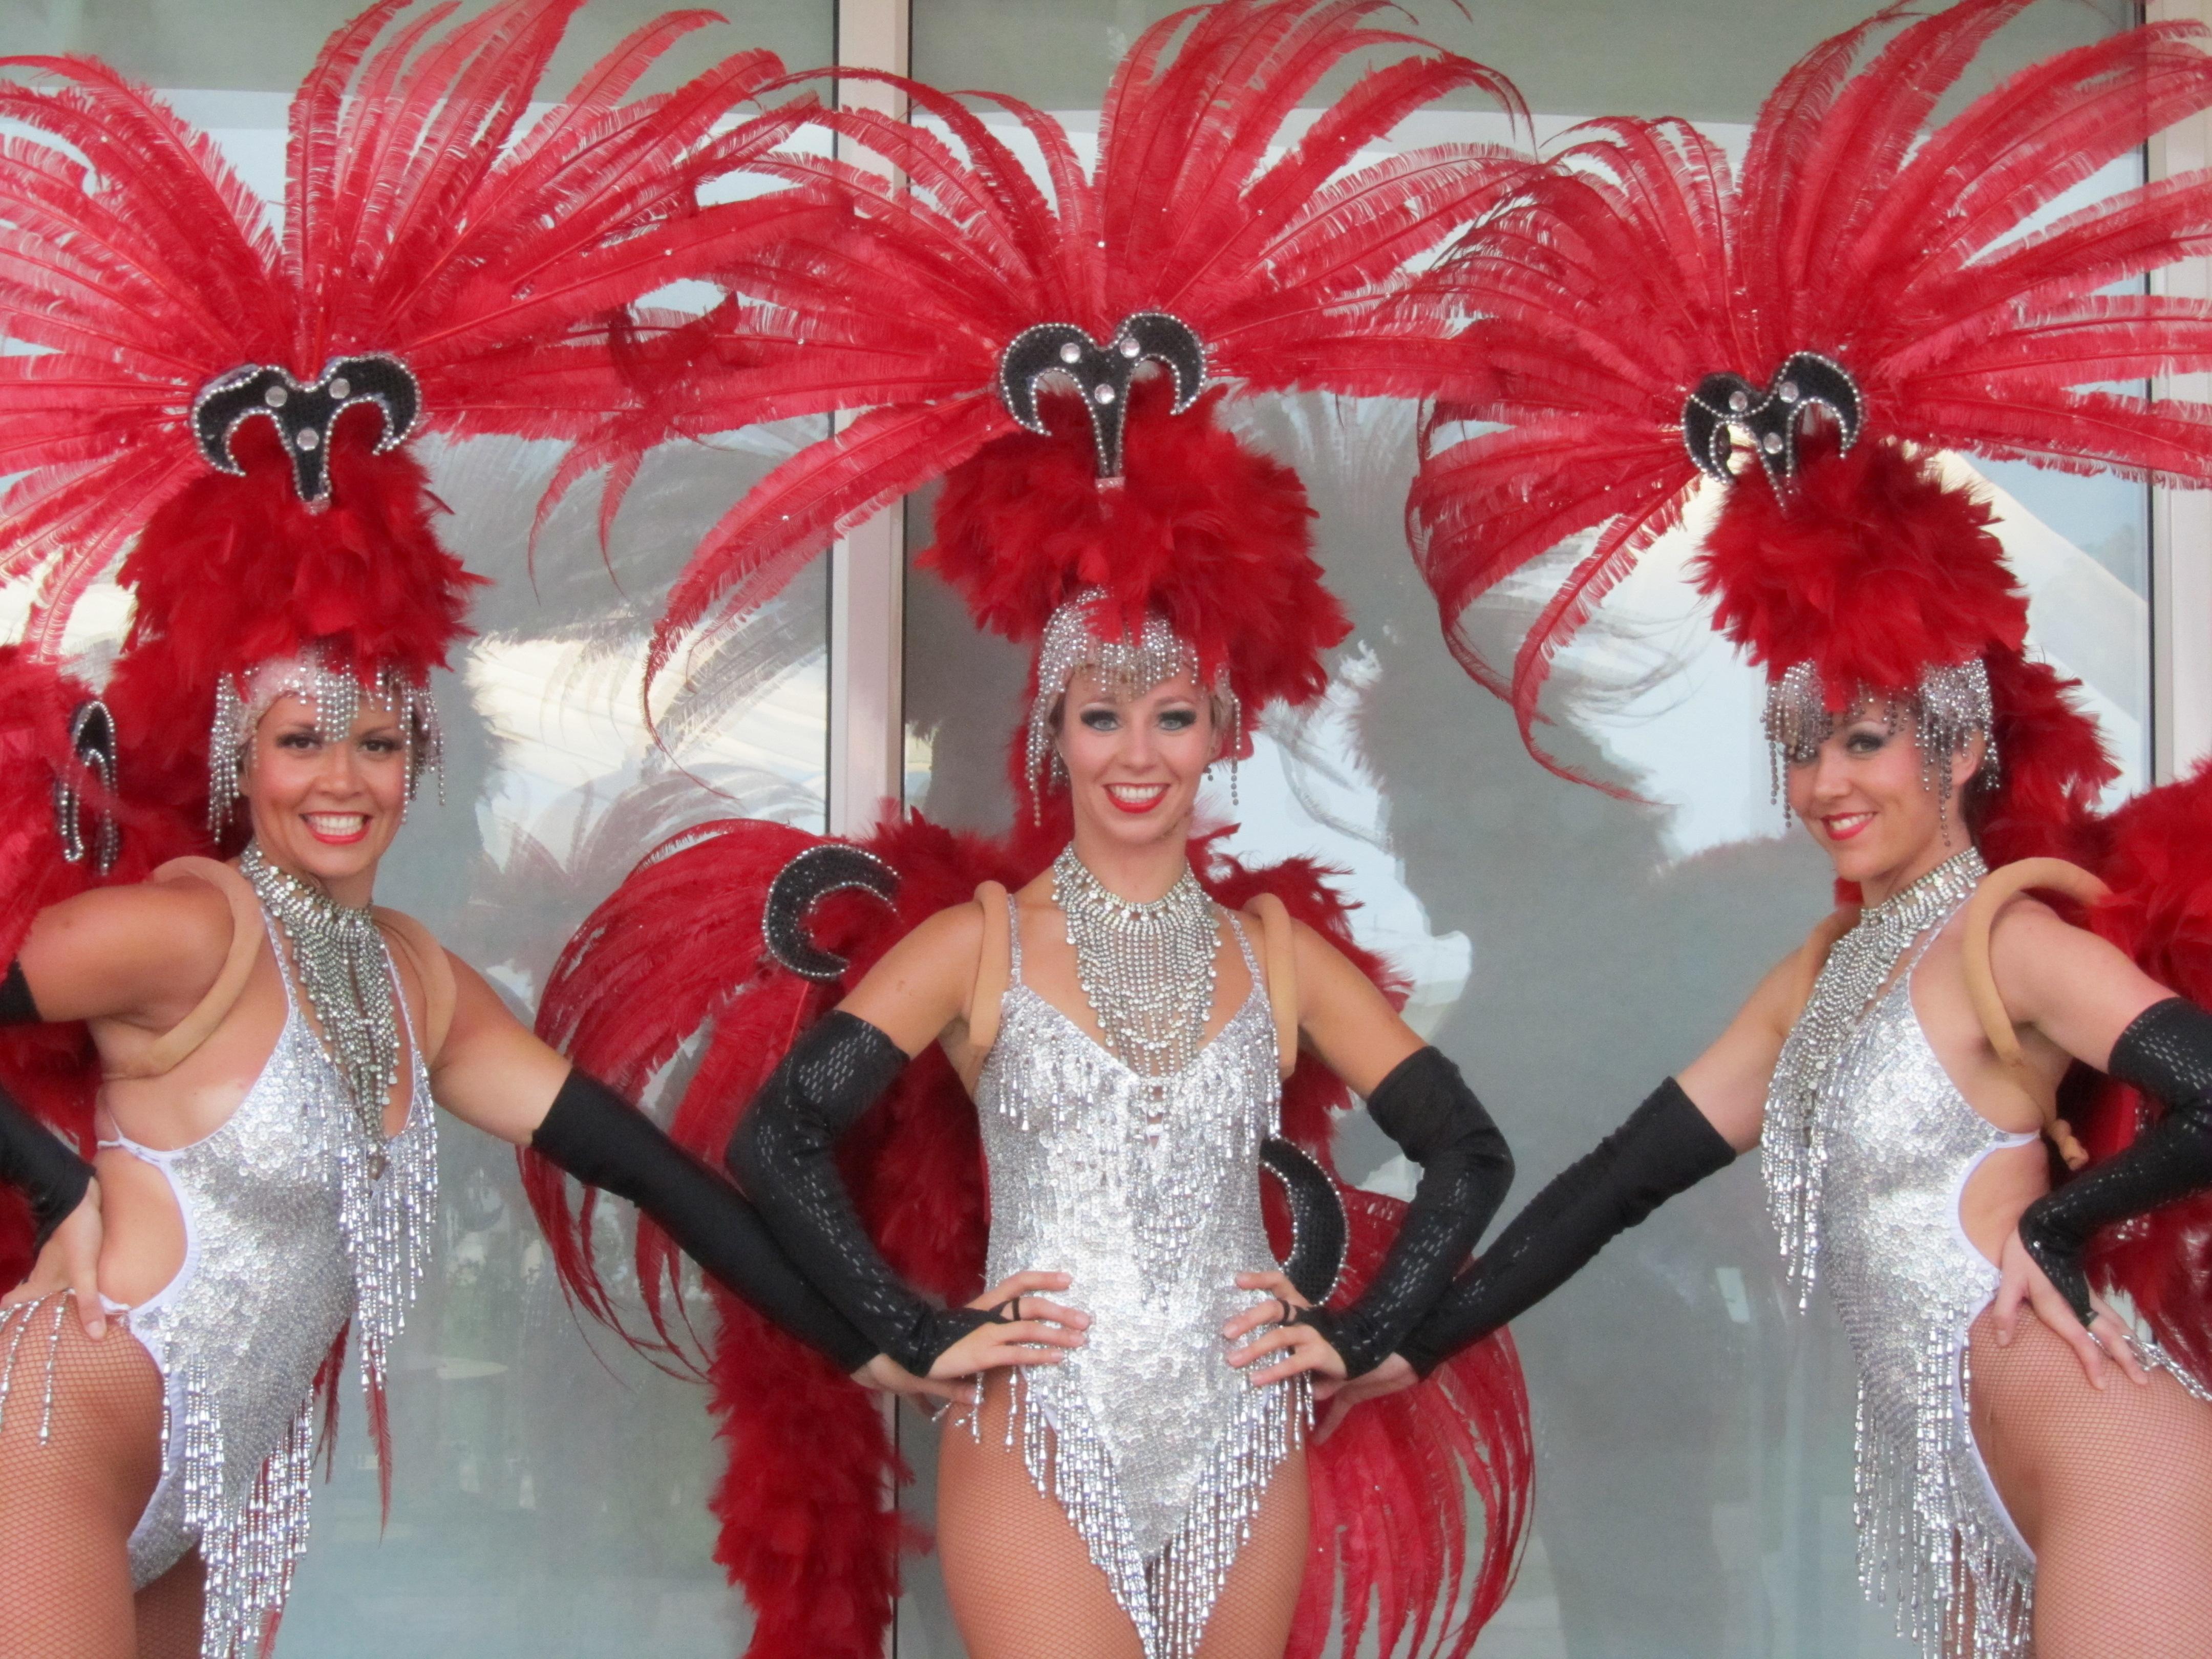 Las Vegas styled showgirls